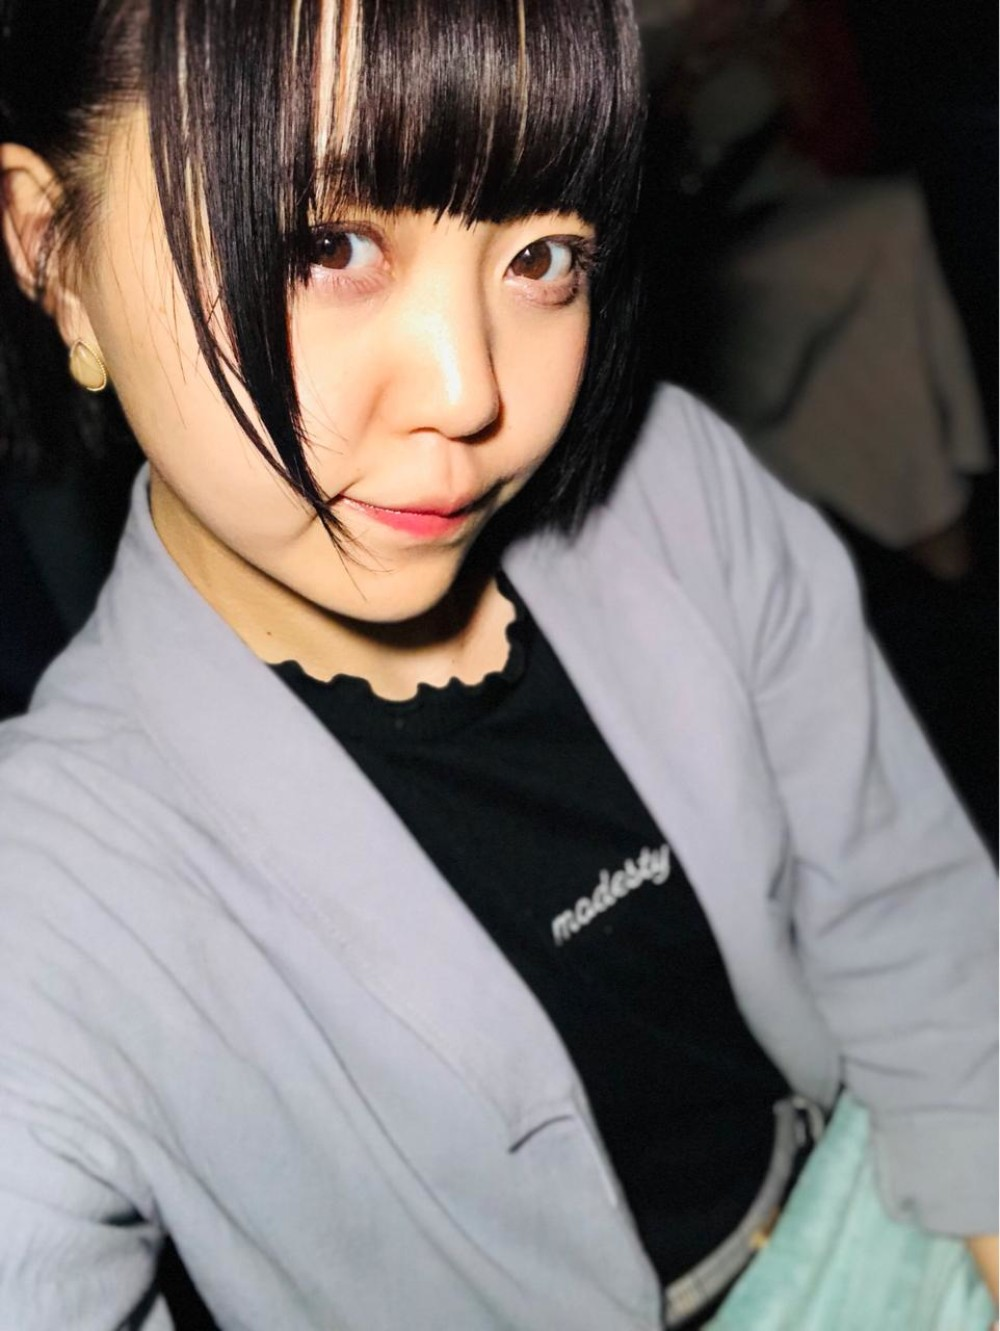 YU-KI(ゆうきりん)(Menkoiガールズ )